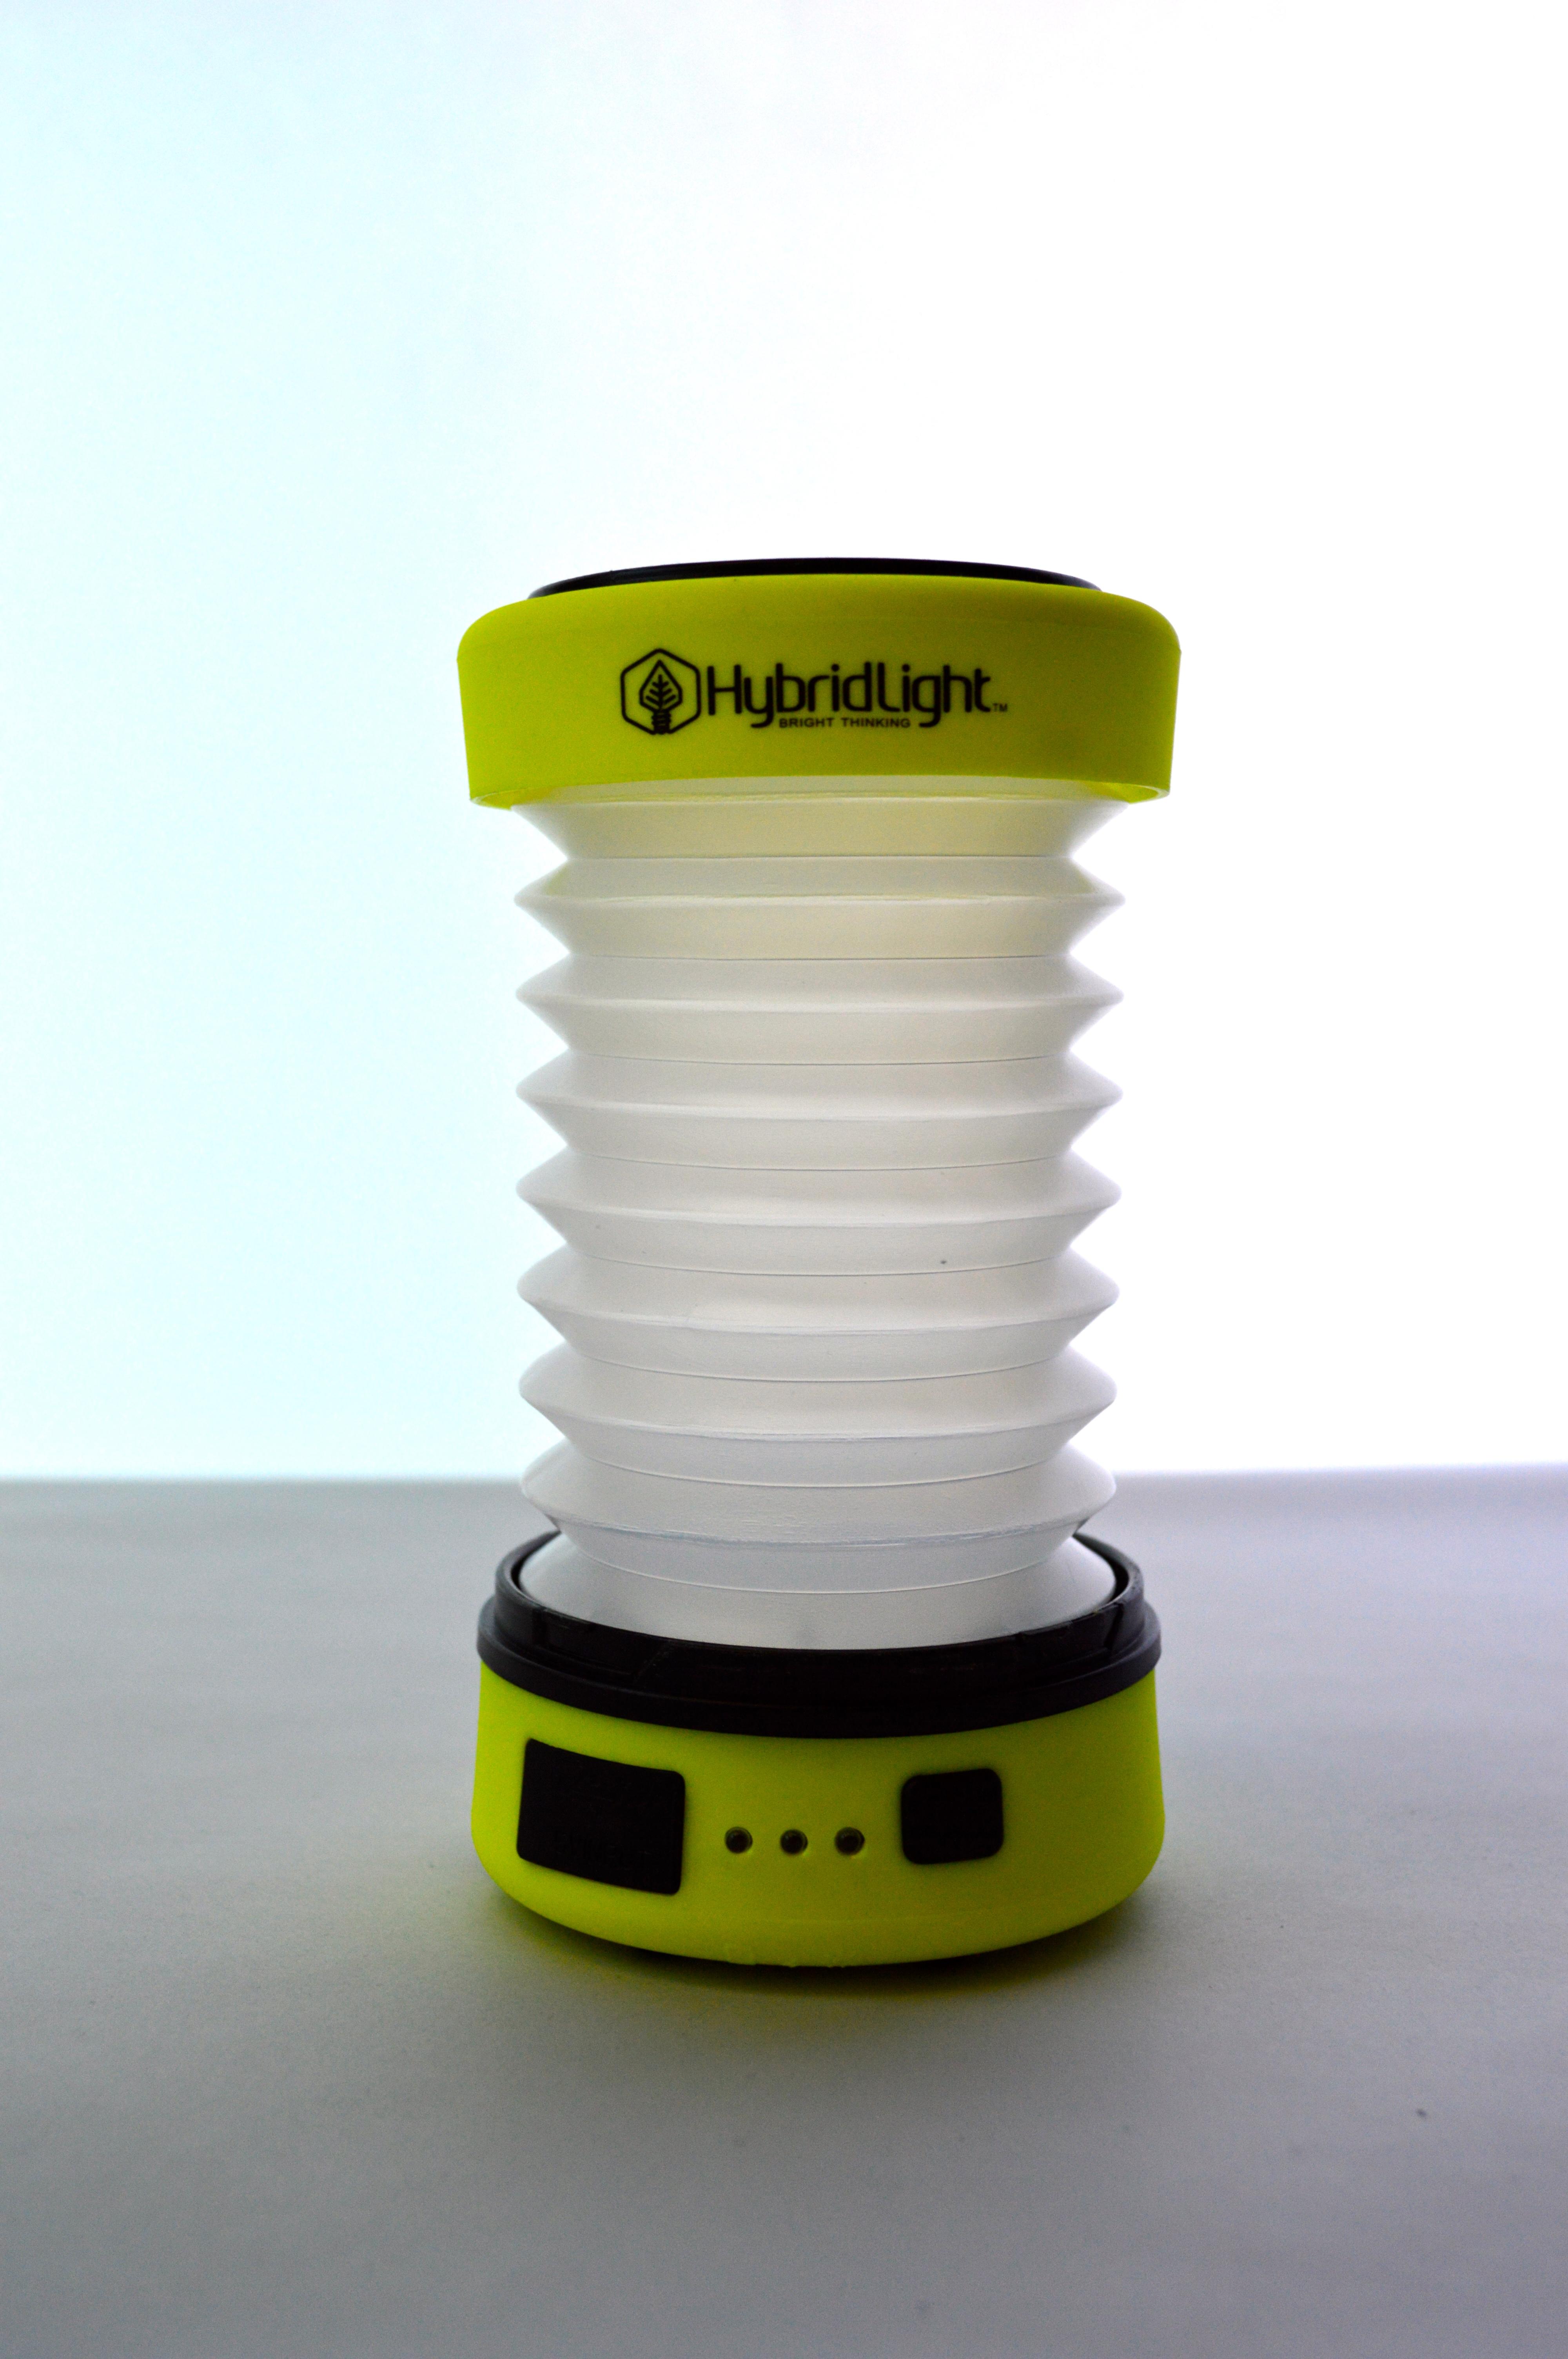 Hybridlight Lantern